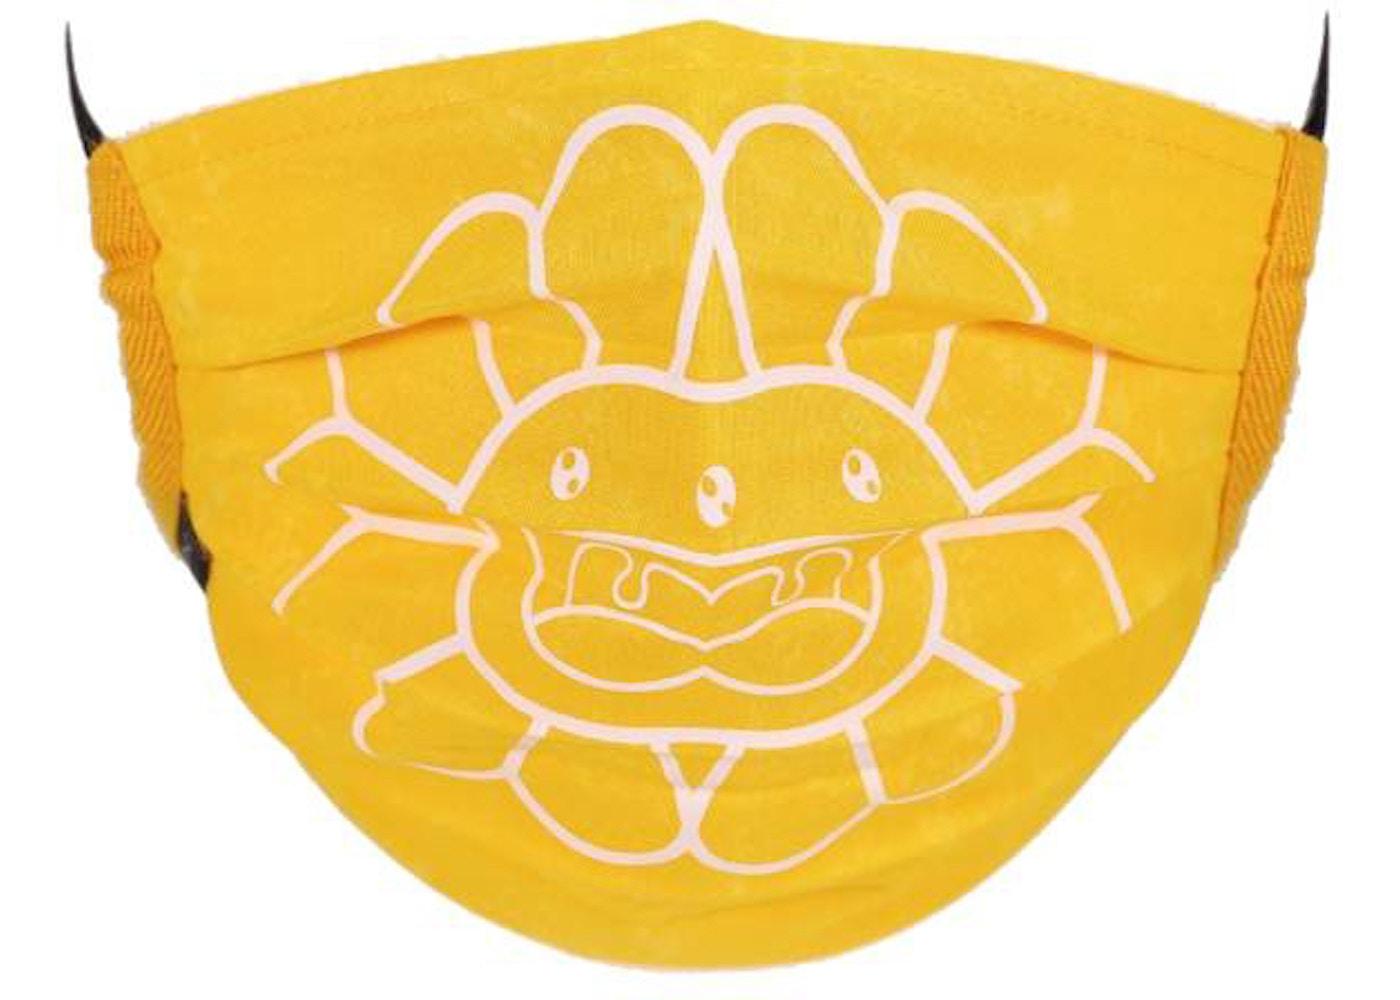 Takashi Murakami Doubleface Flower Face Mask Bright Yellow White